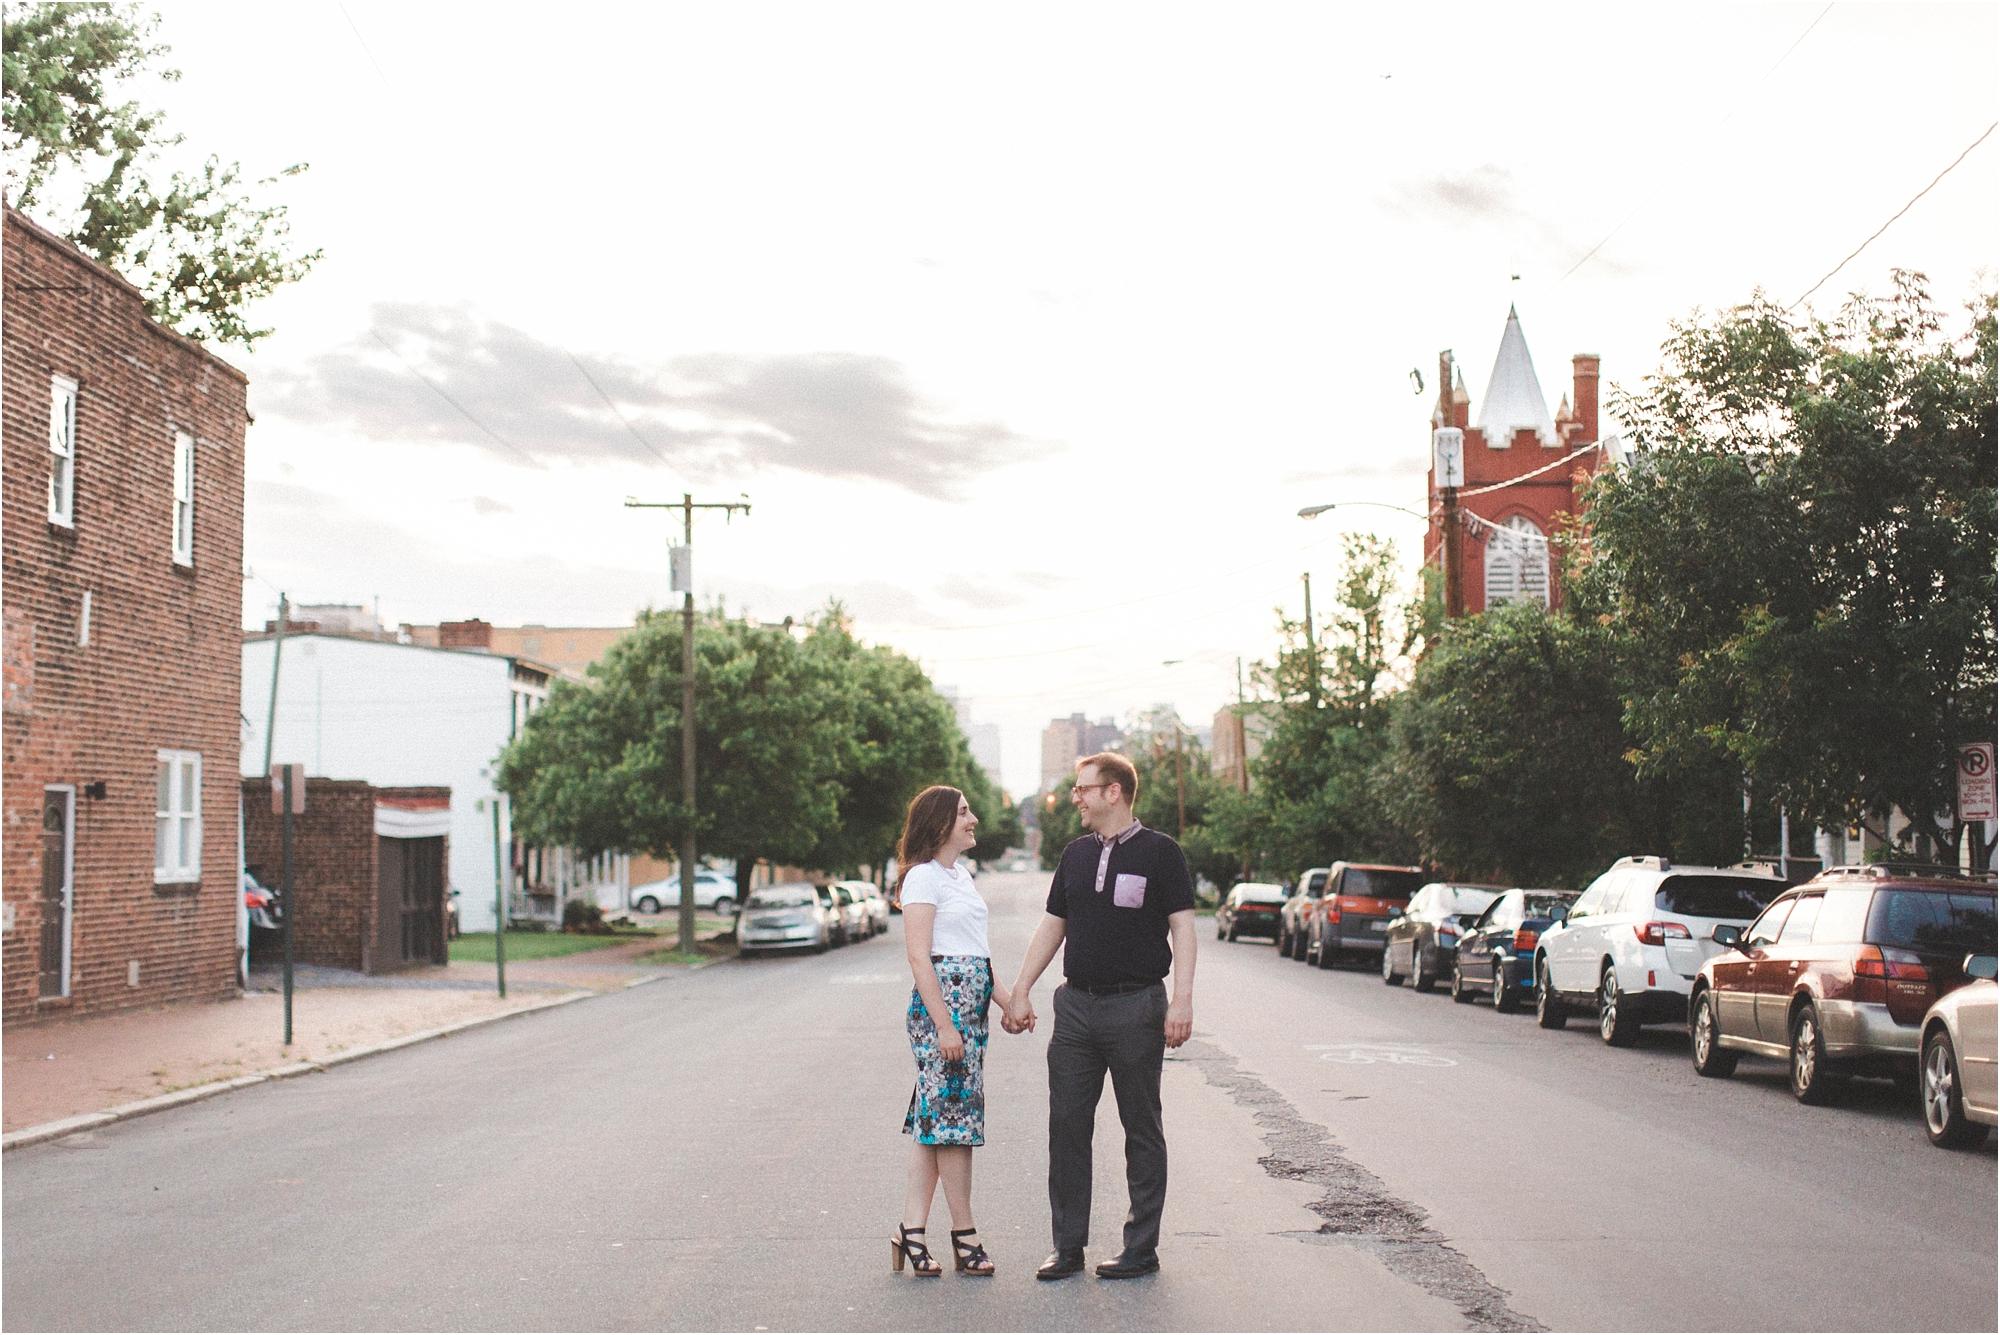 stephanie-yonce-photography-abby-matt-church-hill-engagement-photos_0012.jpg